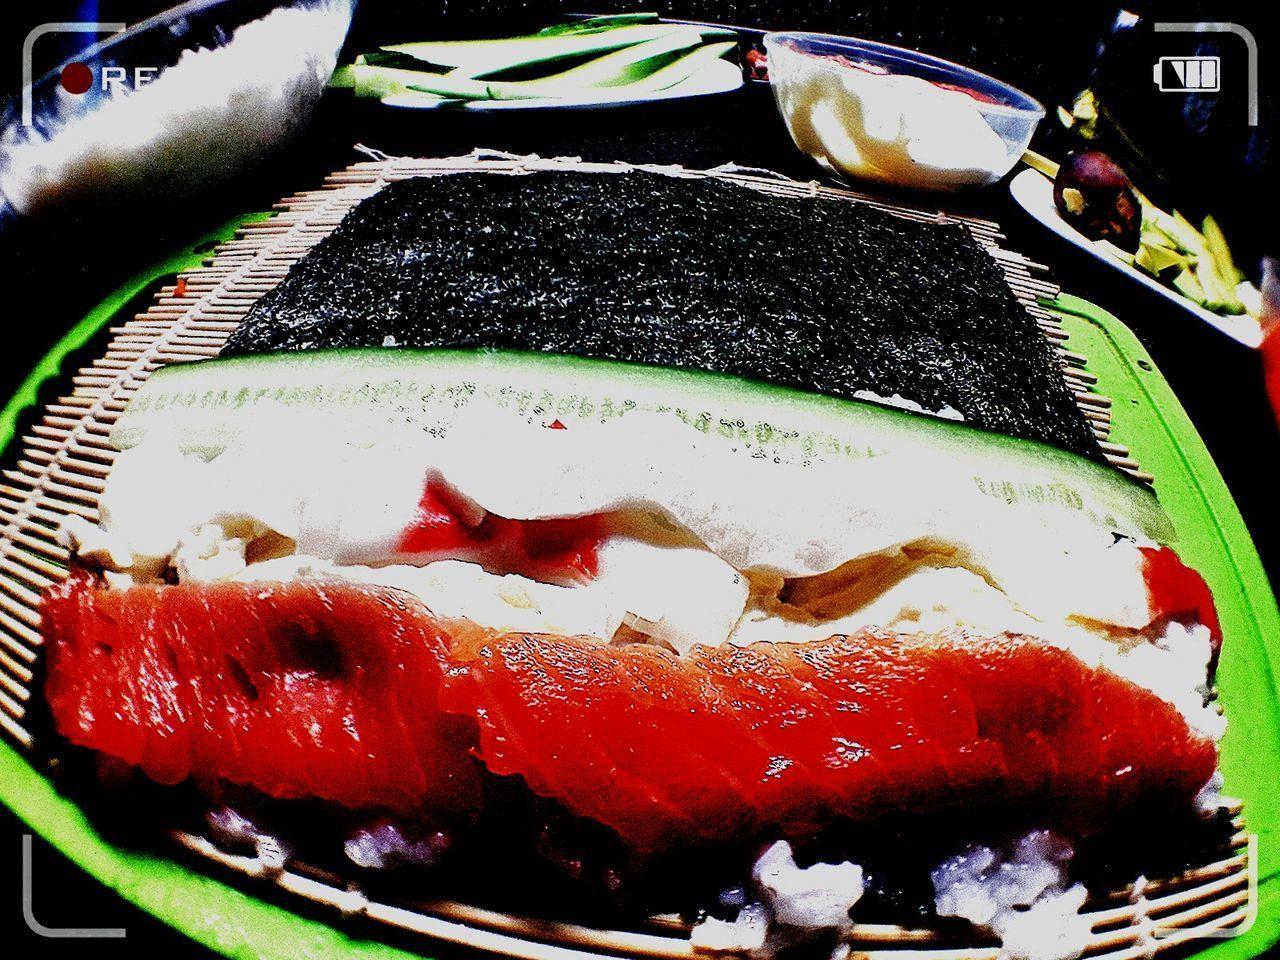 Day Sushi Time Sushi Love Sushihomemade No People Food Colors Handmade Enjoying Life MyLove❤